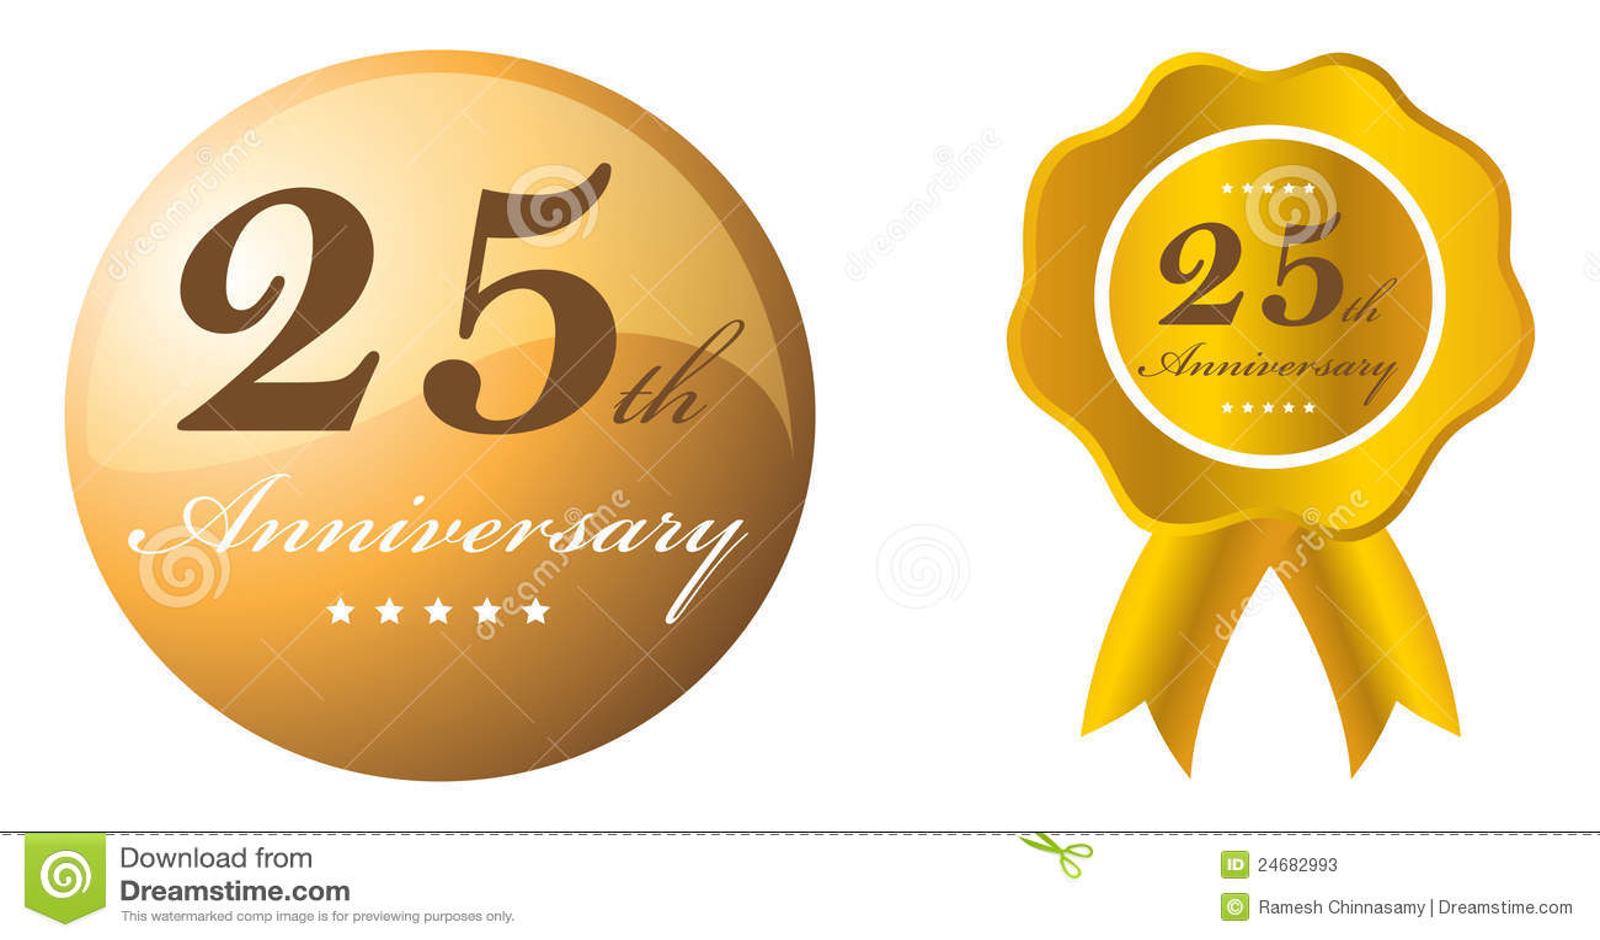 25 Anniversary Invitation is good invitations layout